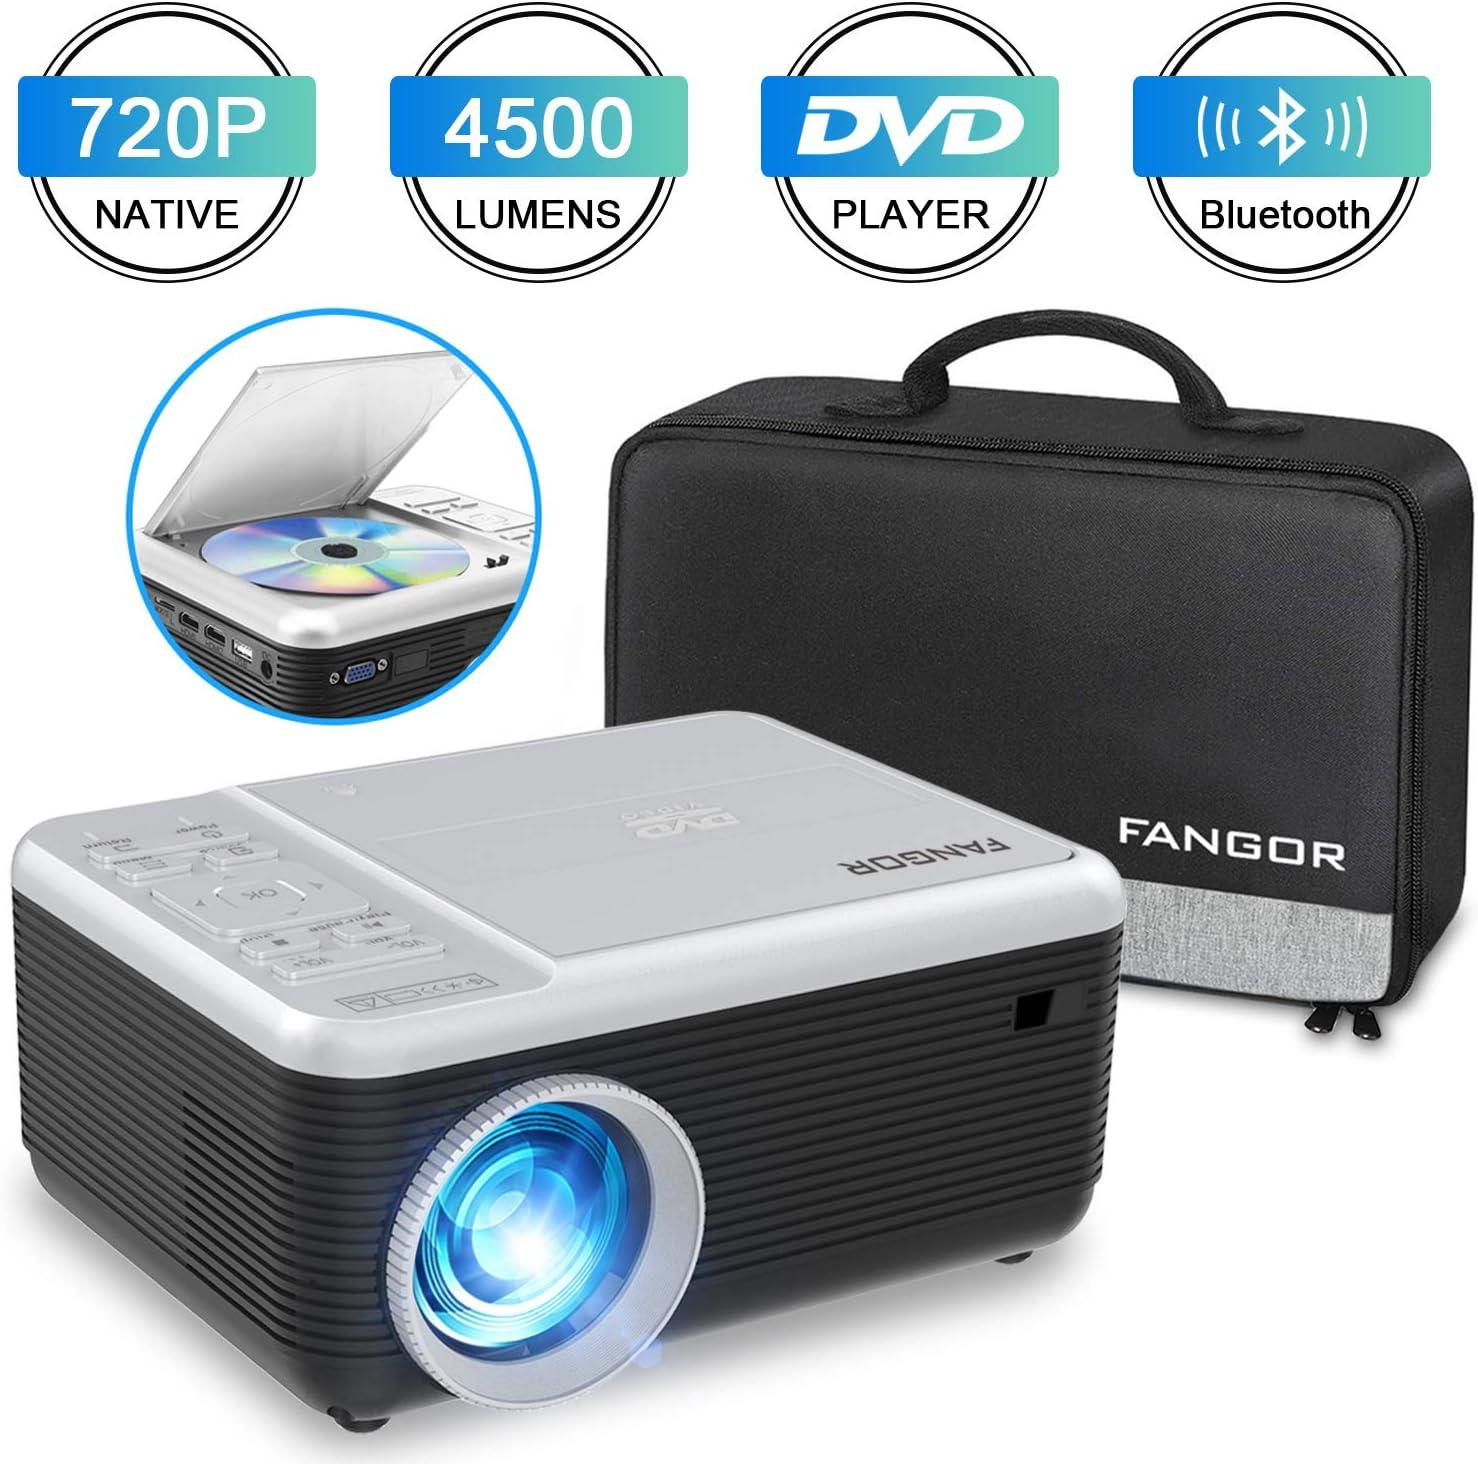 Mini Proyector, FANGOR Mini Video Proyector portátil con Reproductor de DVD,4500Lux proyector de Cine en casa Bluetooth 720P Nativa,Compatible con HDMI/USB/Micro SD/VGA/Fire TV Stick/PS4/ Xbox